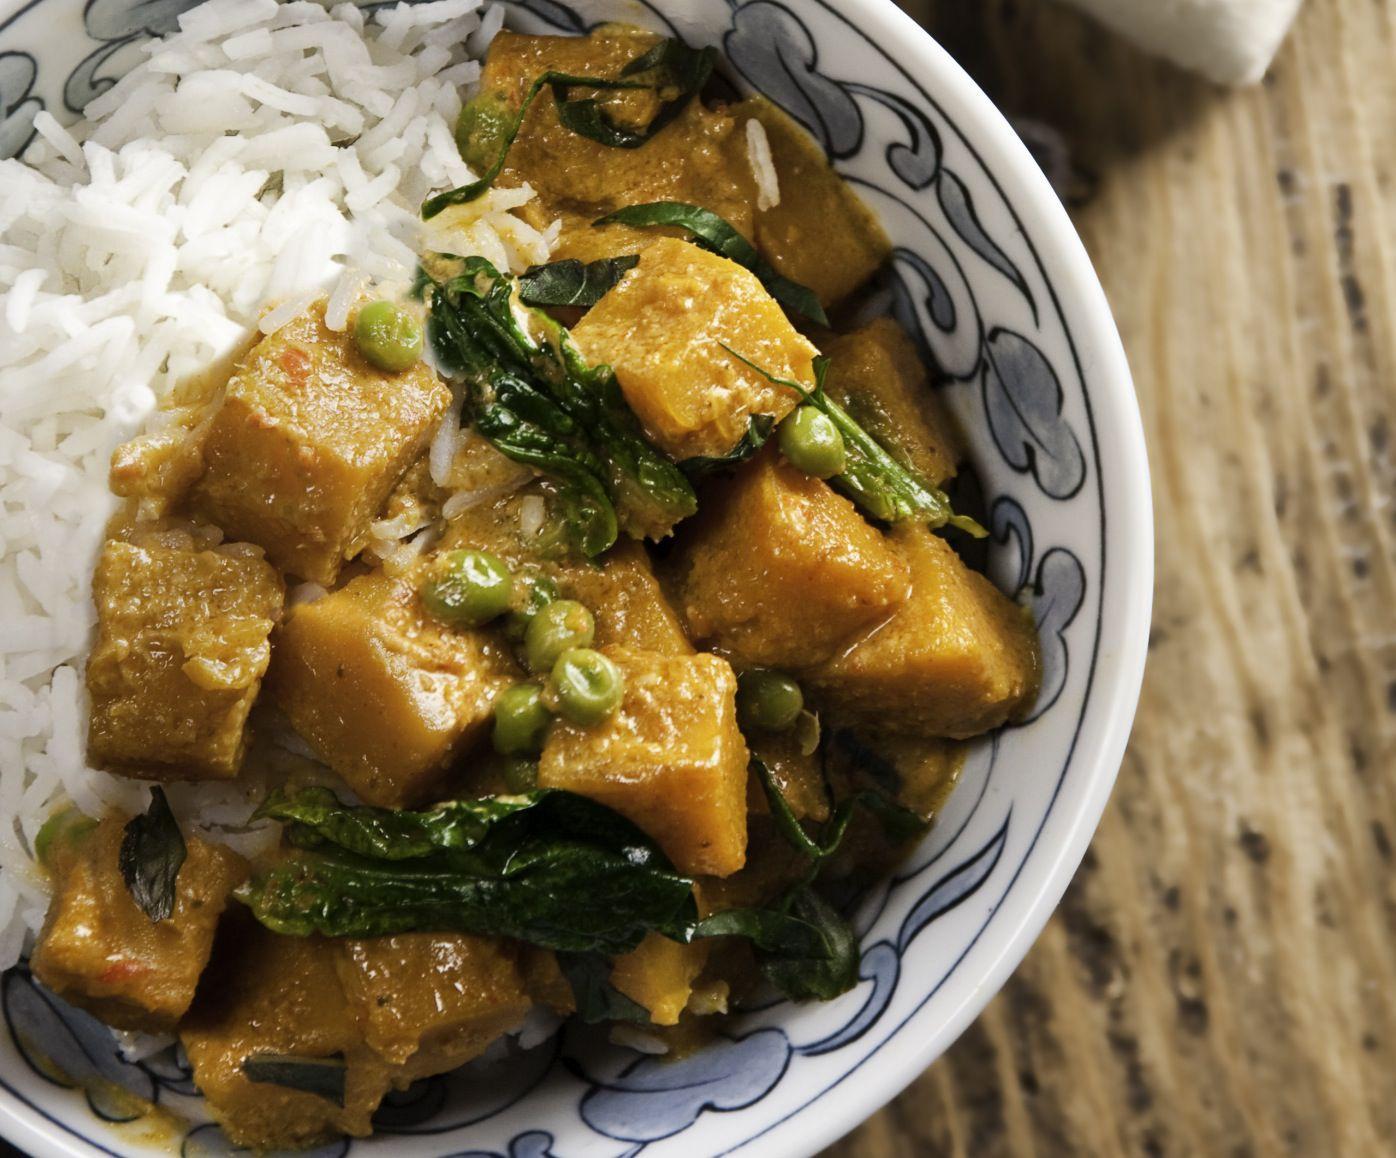 10 glutenfree vegan recipes for dinner tonight with